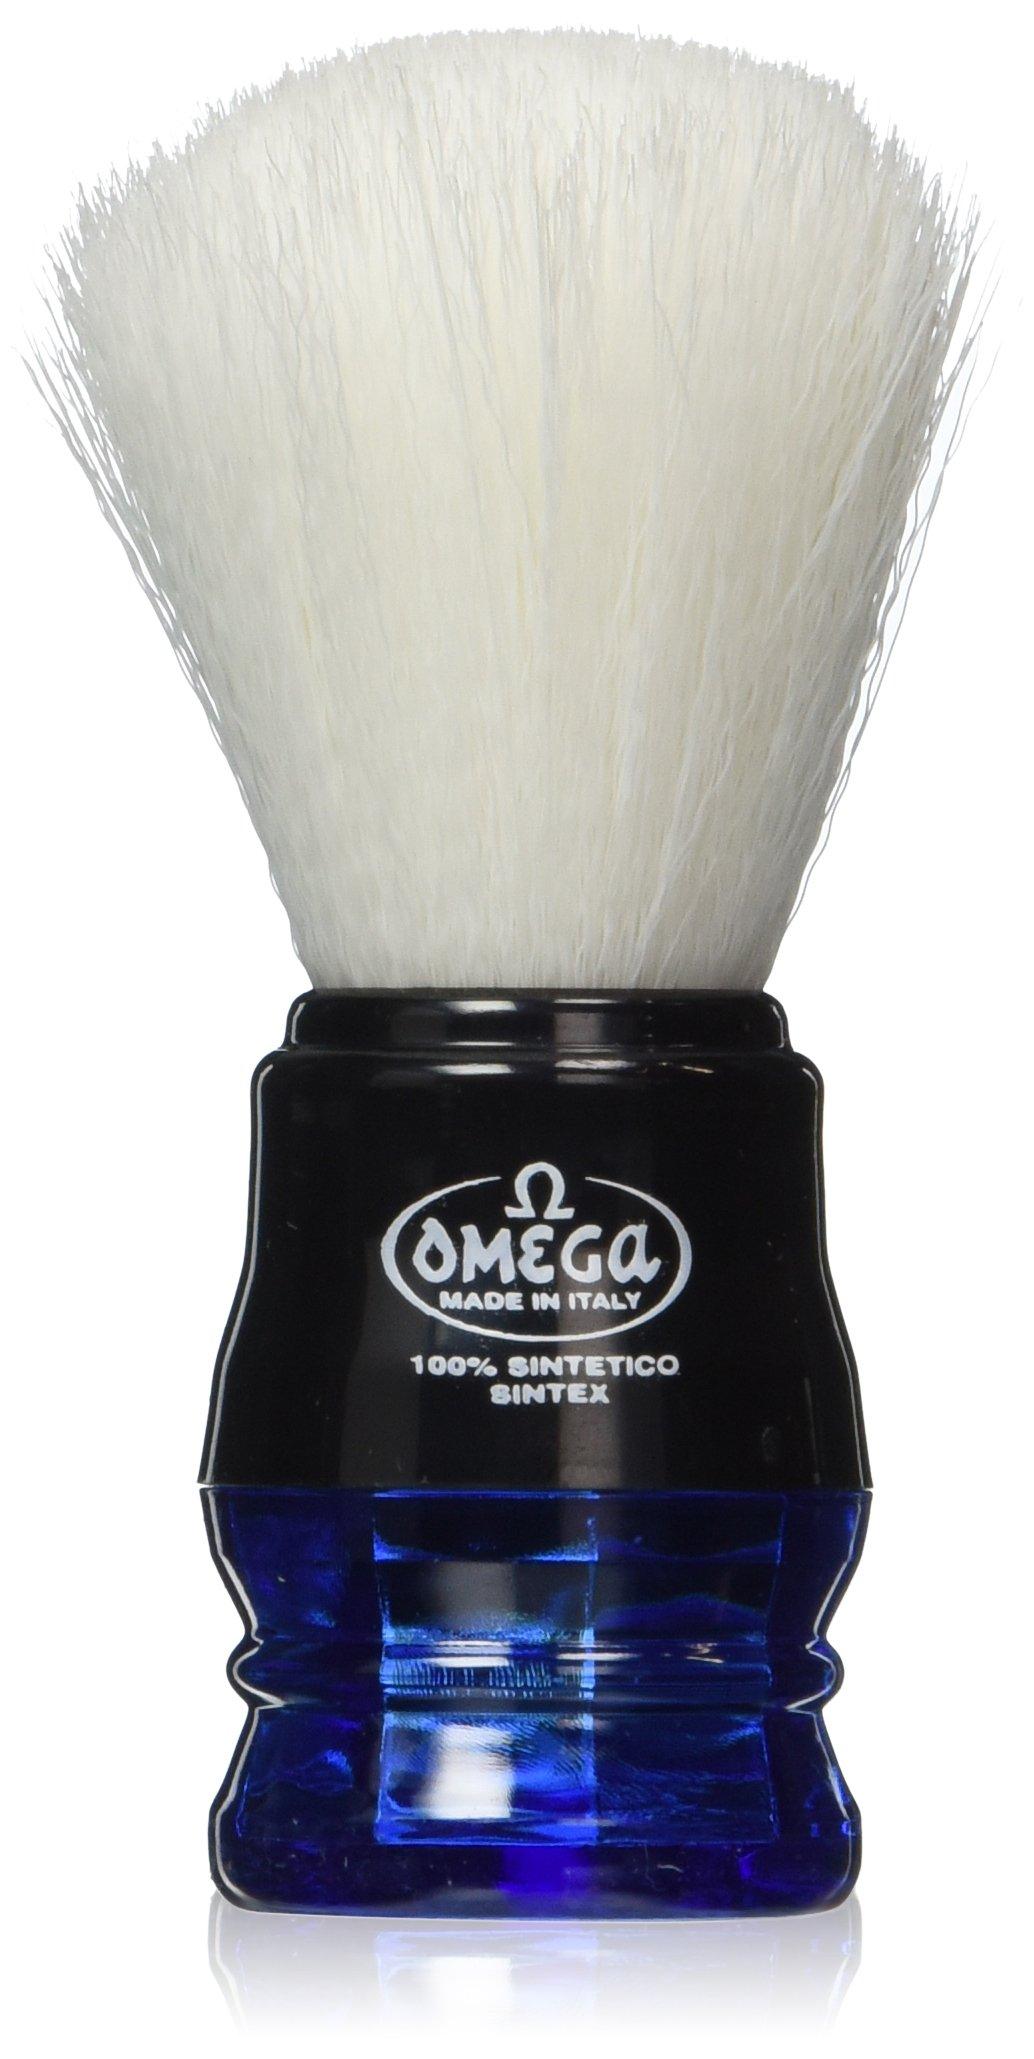 Omega Blue Handle Syntex Synthetic Fibre Shaving Brush Vegan Cruelty Free